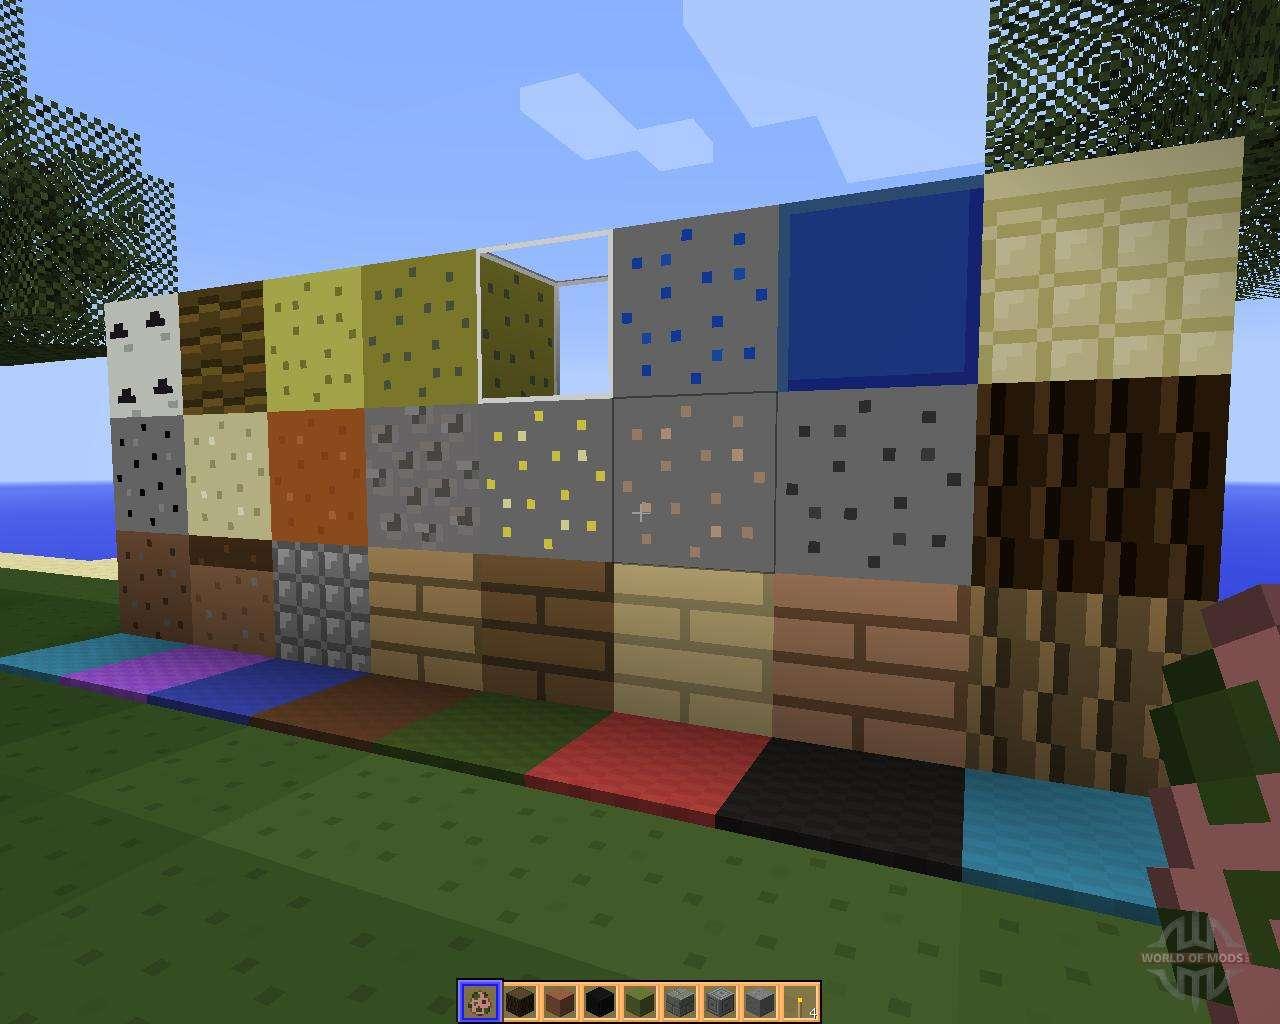 3д текстуры для майнкрафт 1.7.2 #11